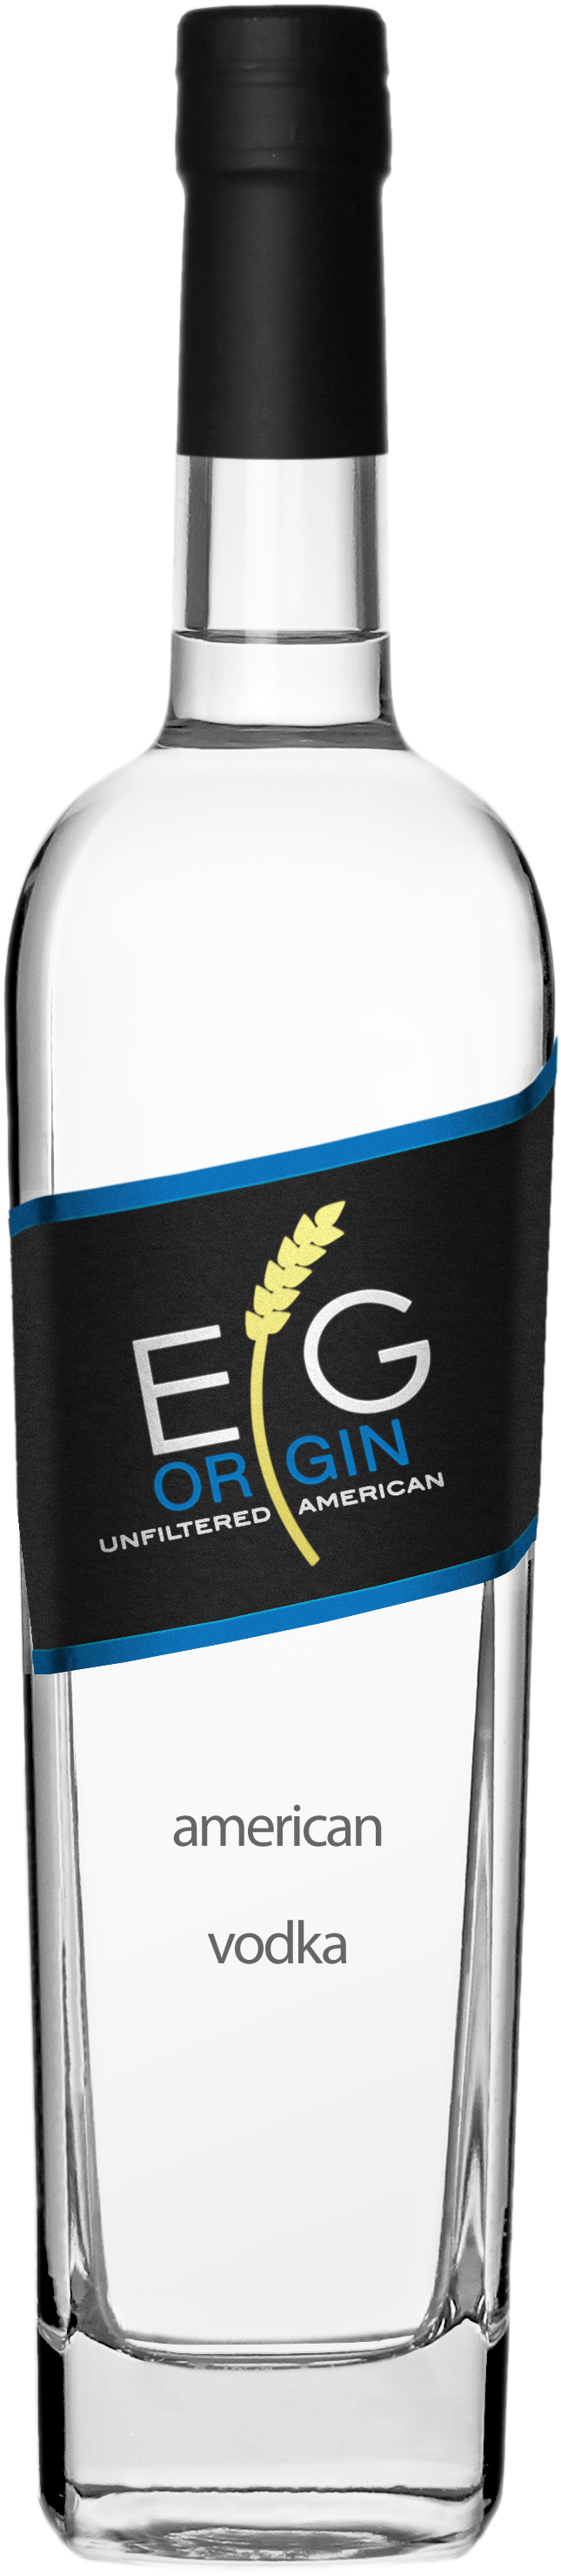 EG Origin Vodka